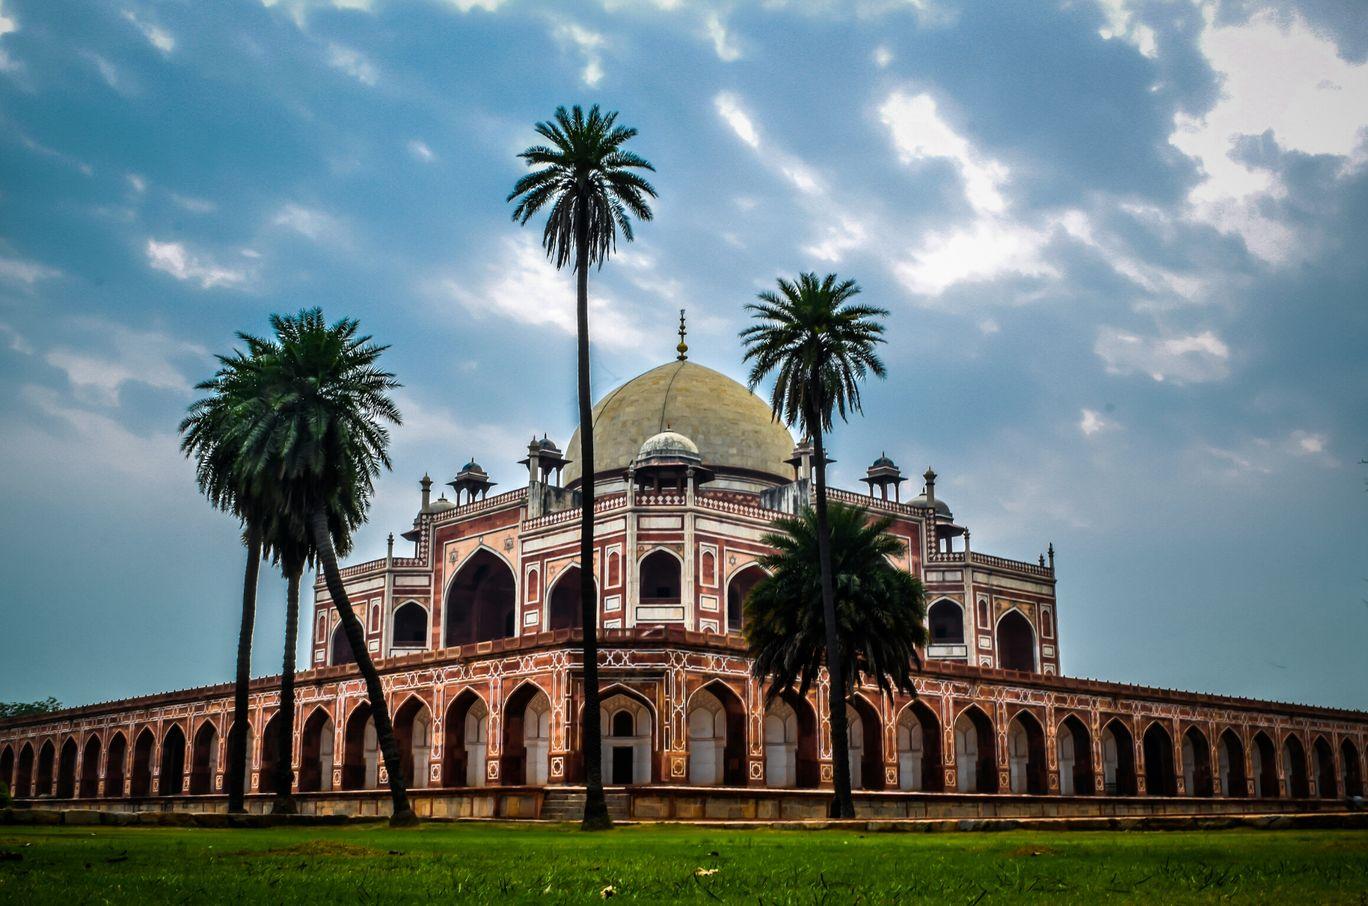 Photo of New Delhi By TDI VISUALS